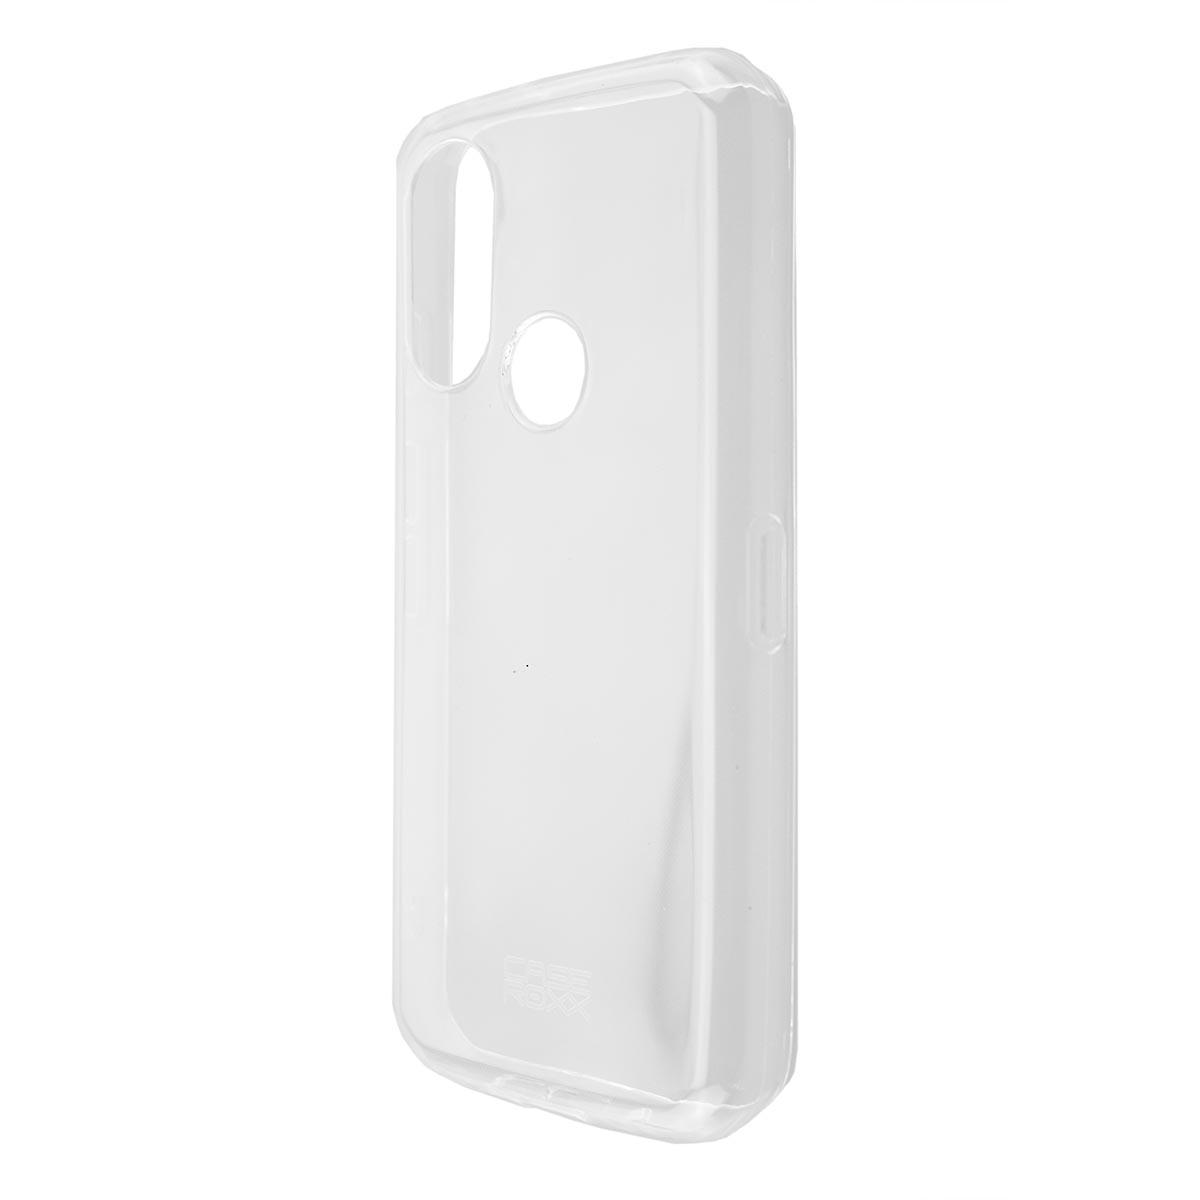 Caseroxx-TPU-Case-pour-Cat-S62-Pro-fait-de-TPU miniature 29